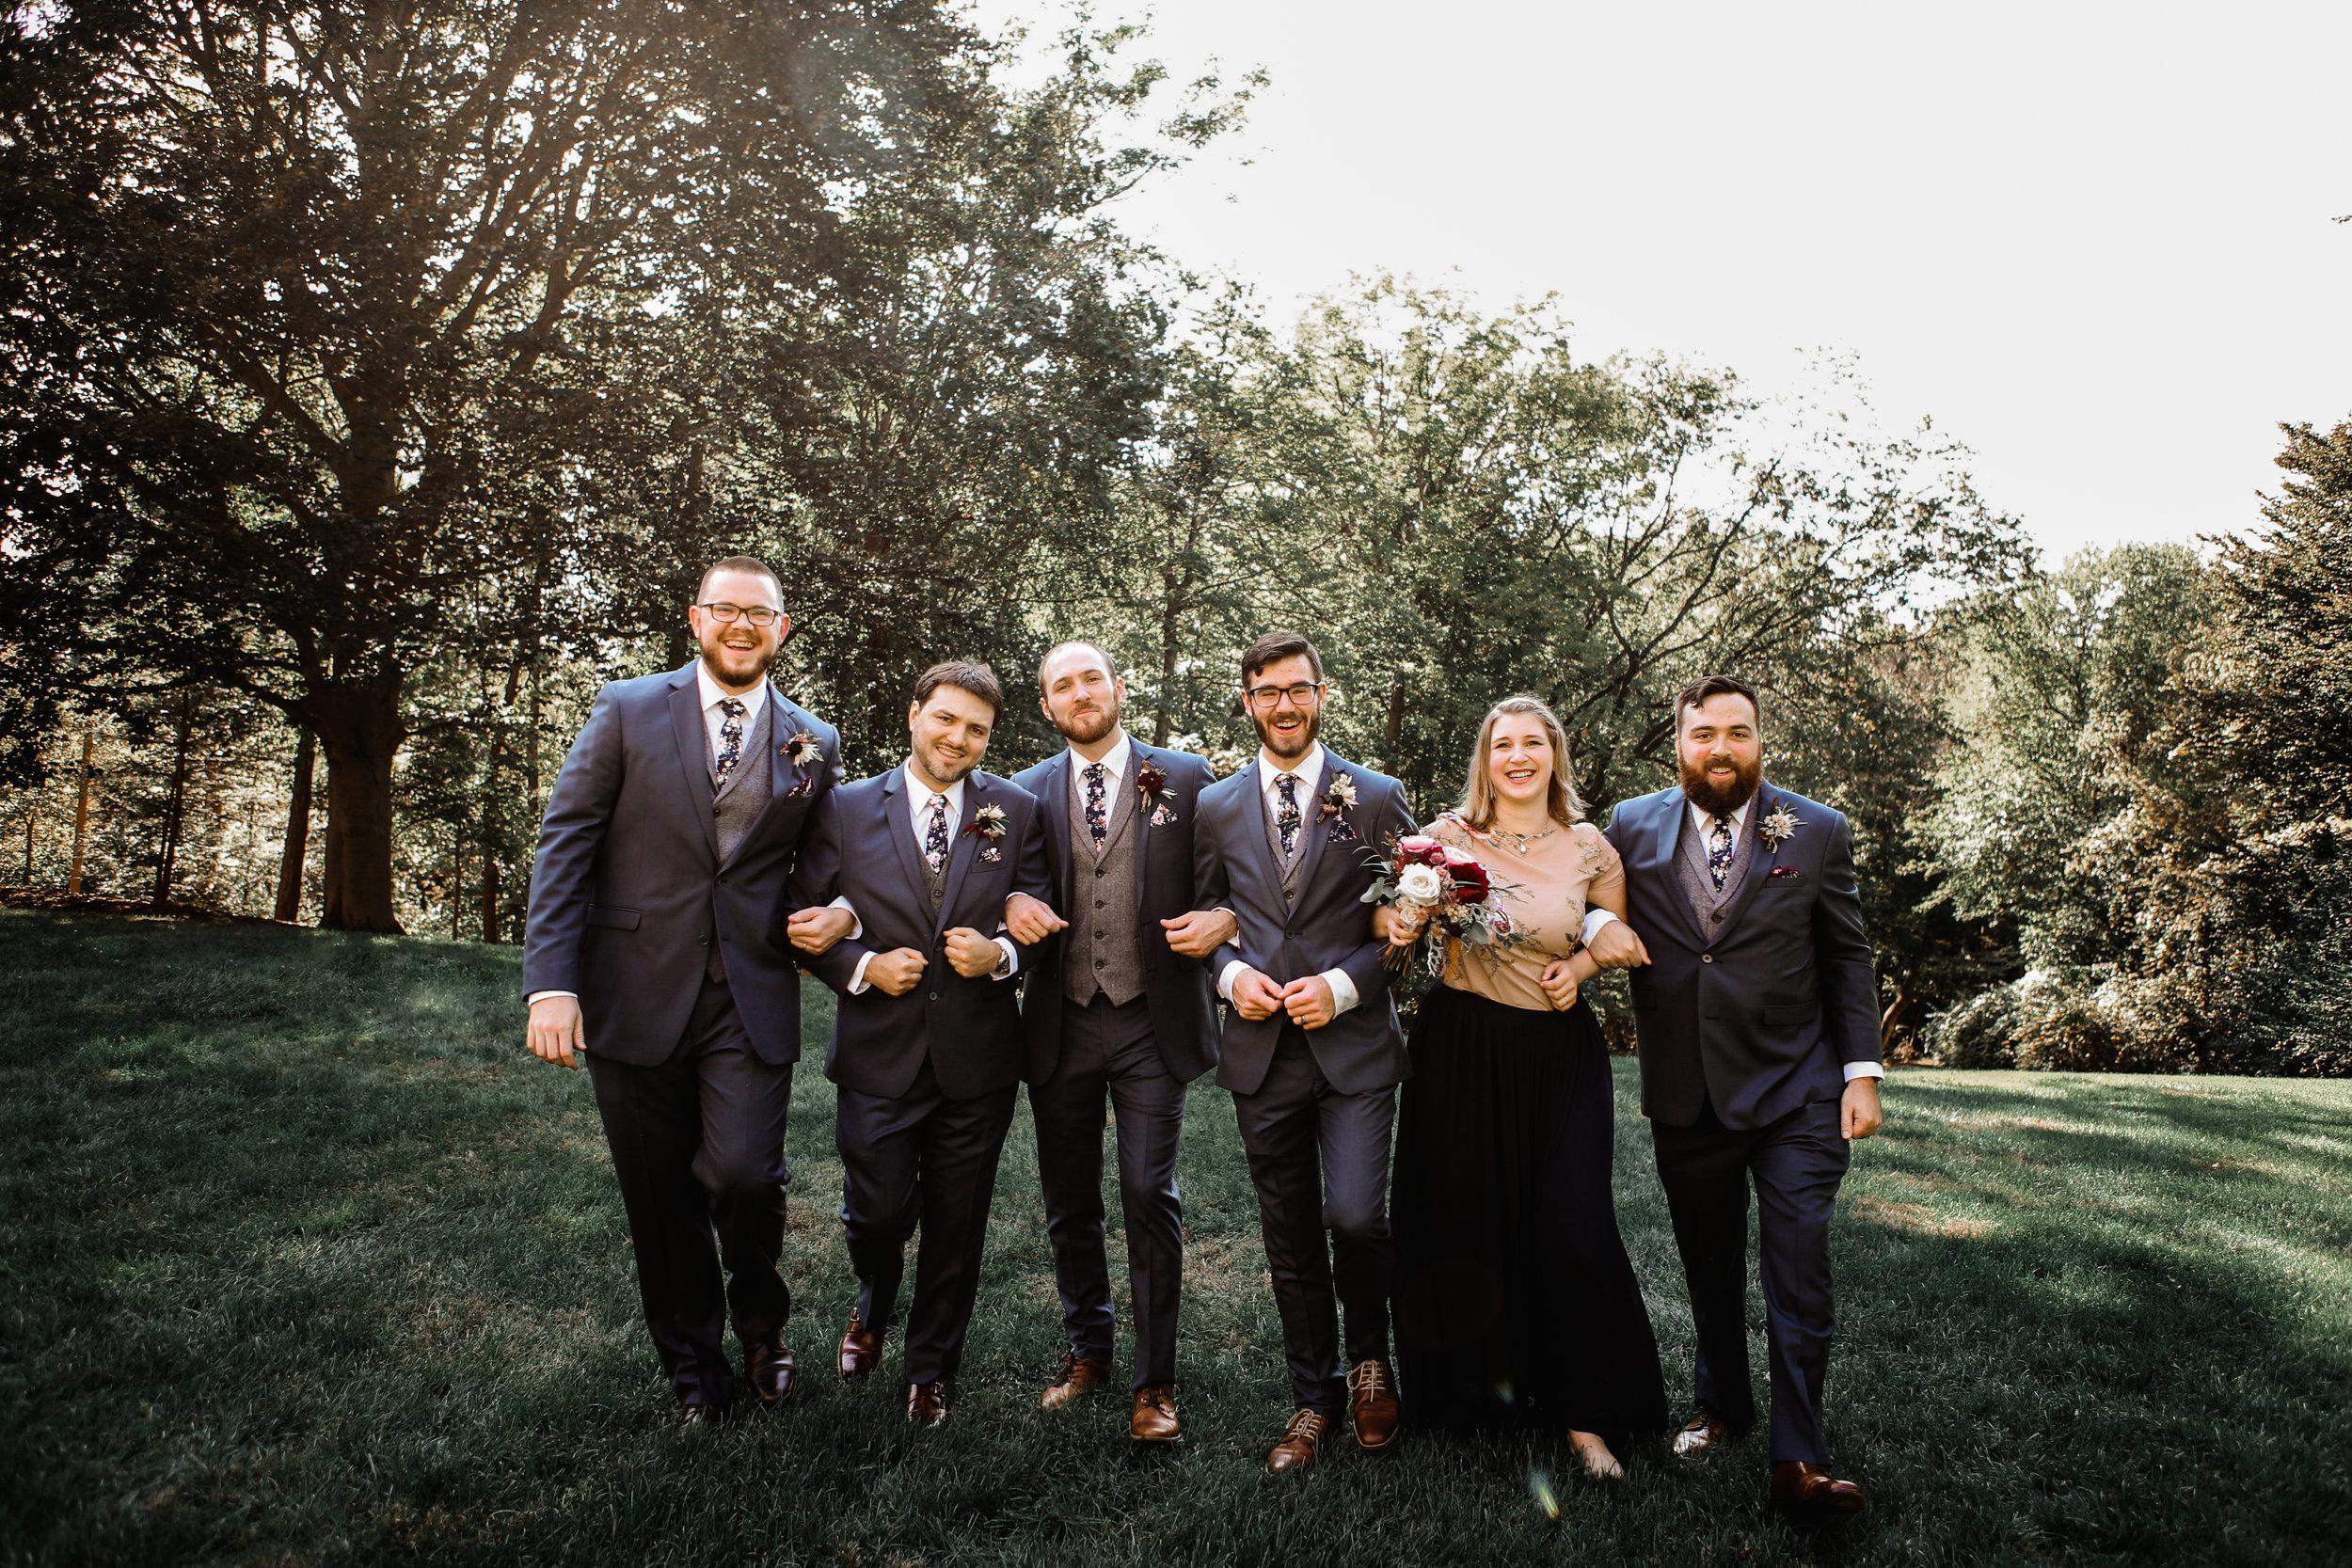 LDP_McNeiveWedding_WeddingParty_017.JPG